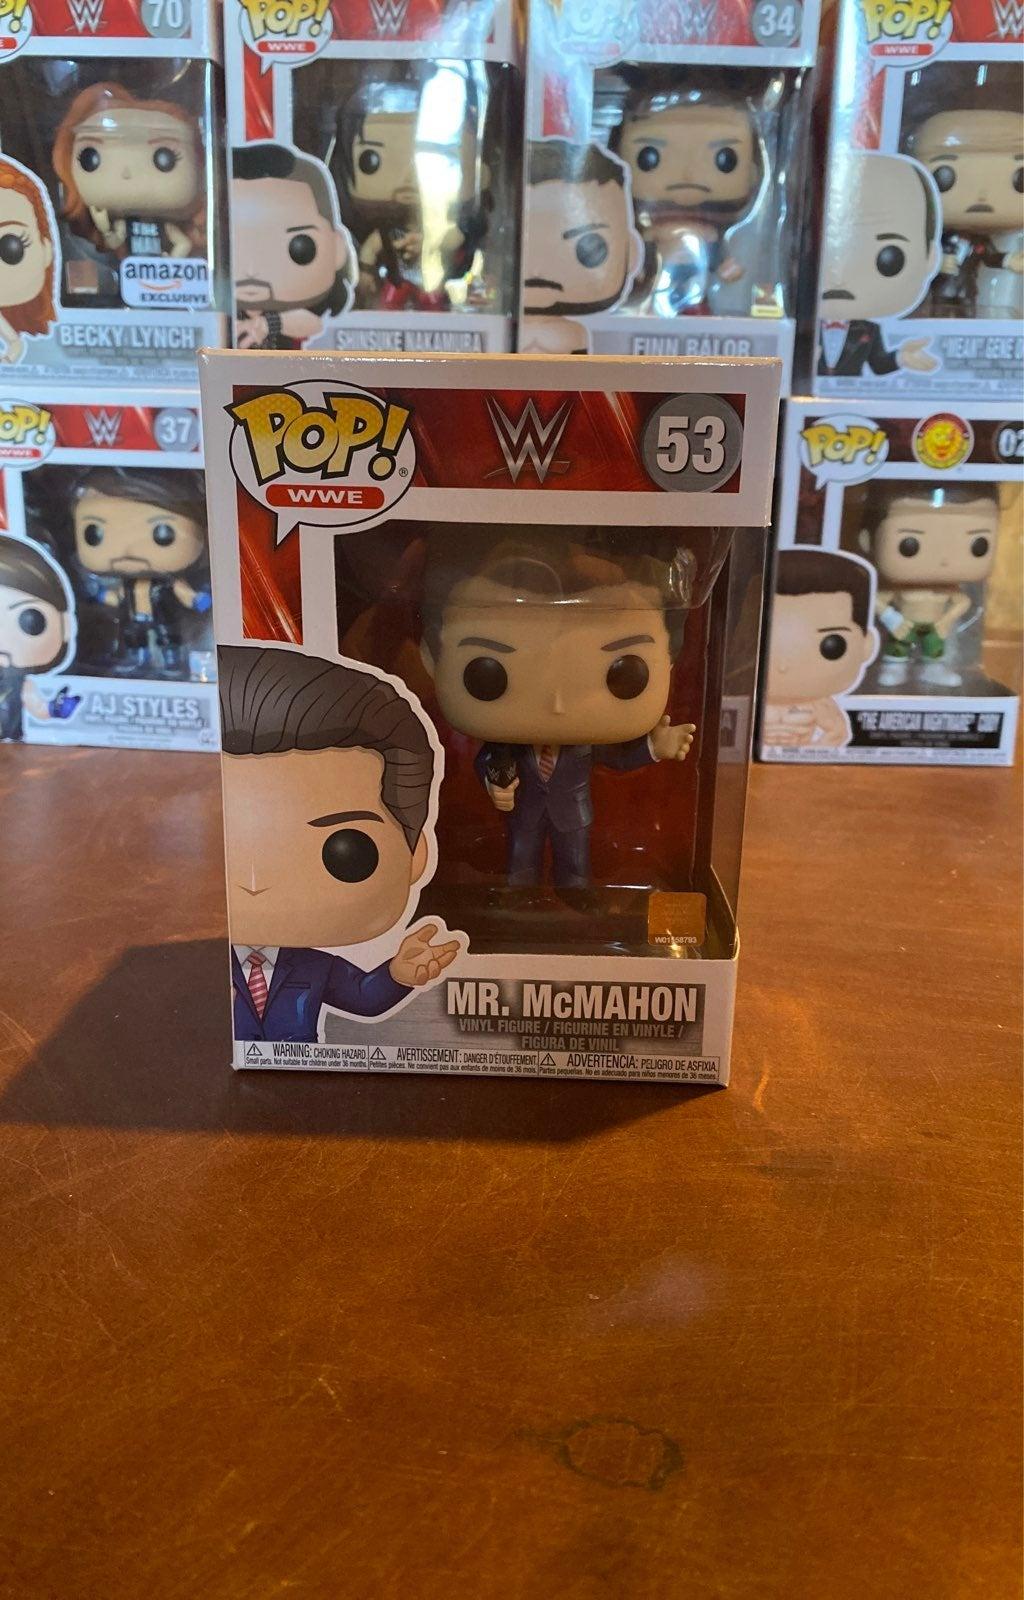 Mr. McMahon #53